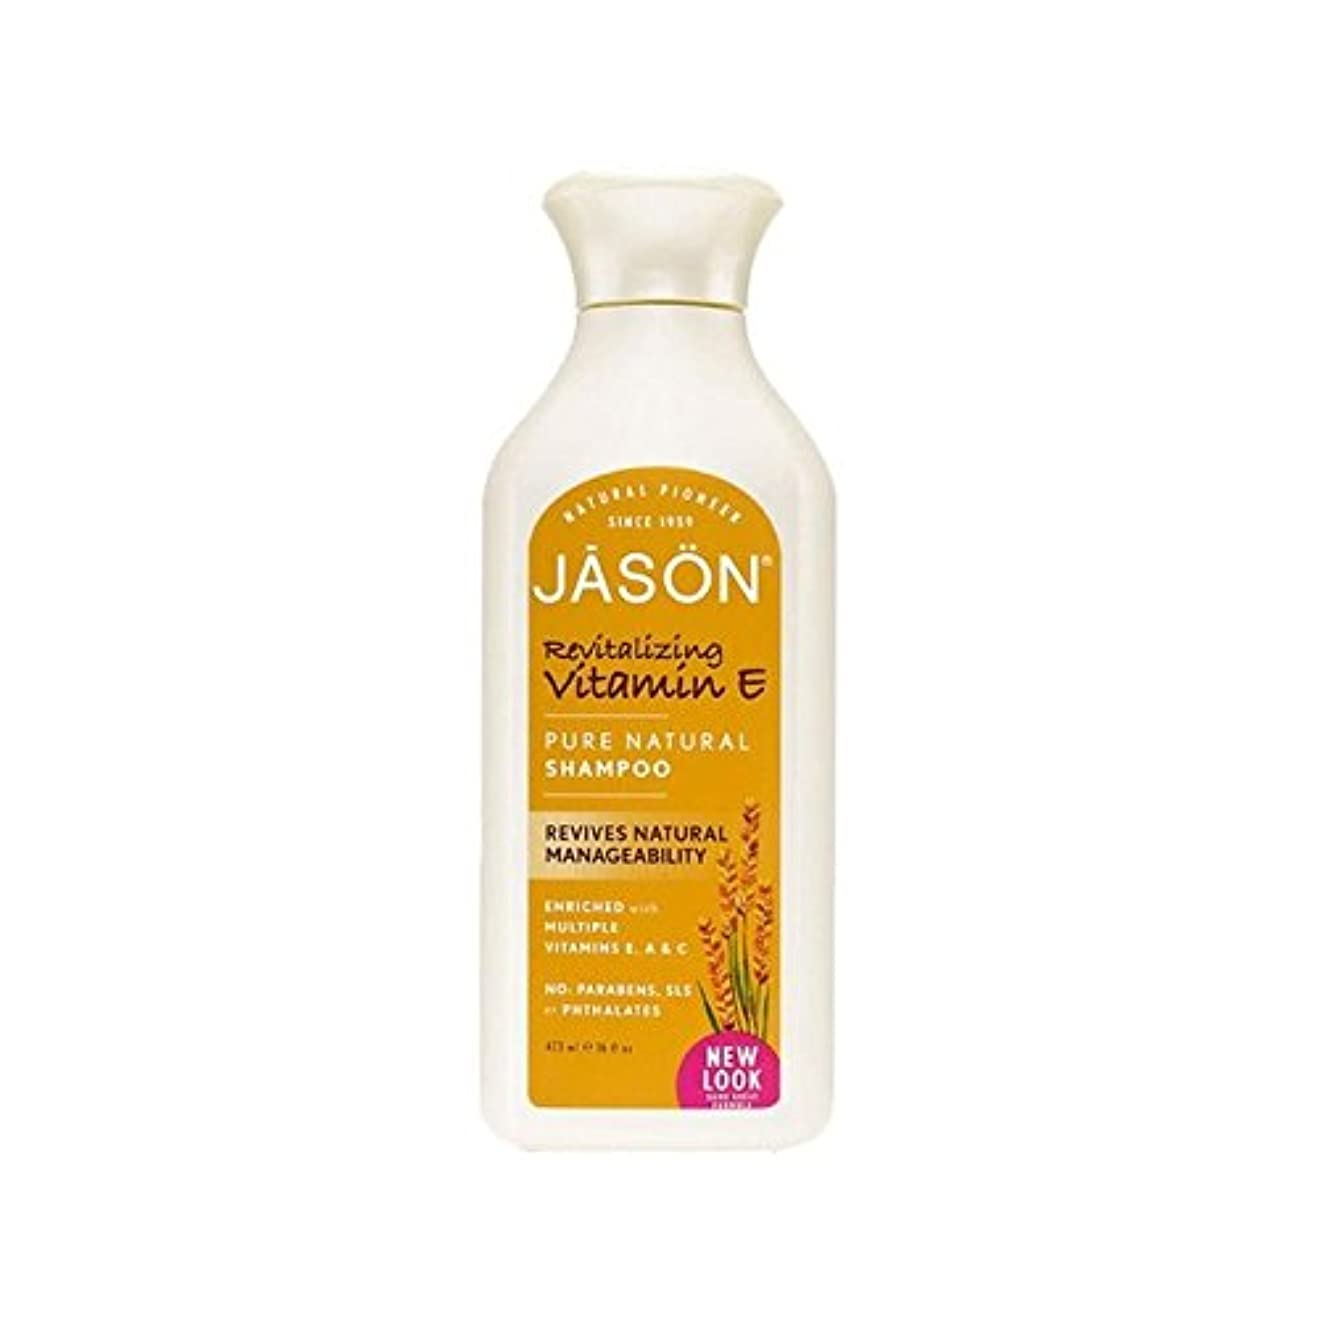 Jason Vitamin E With A & C E Shampoo (473ml) (Pack of 6) - & シャンプー(473ミリリットル)とジェイソン?ビタミン x6 [並行輸入品]